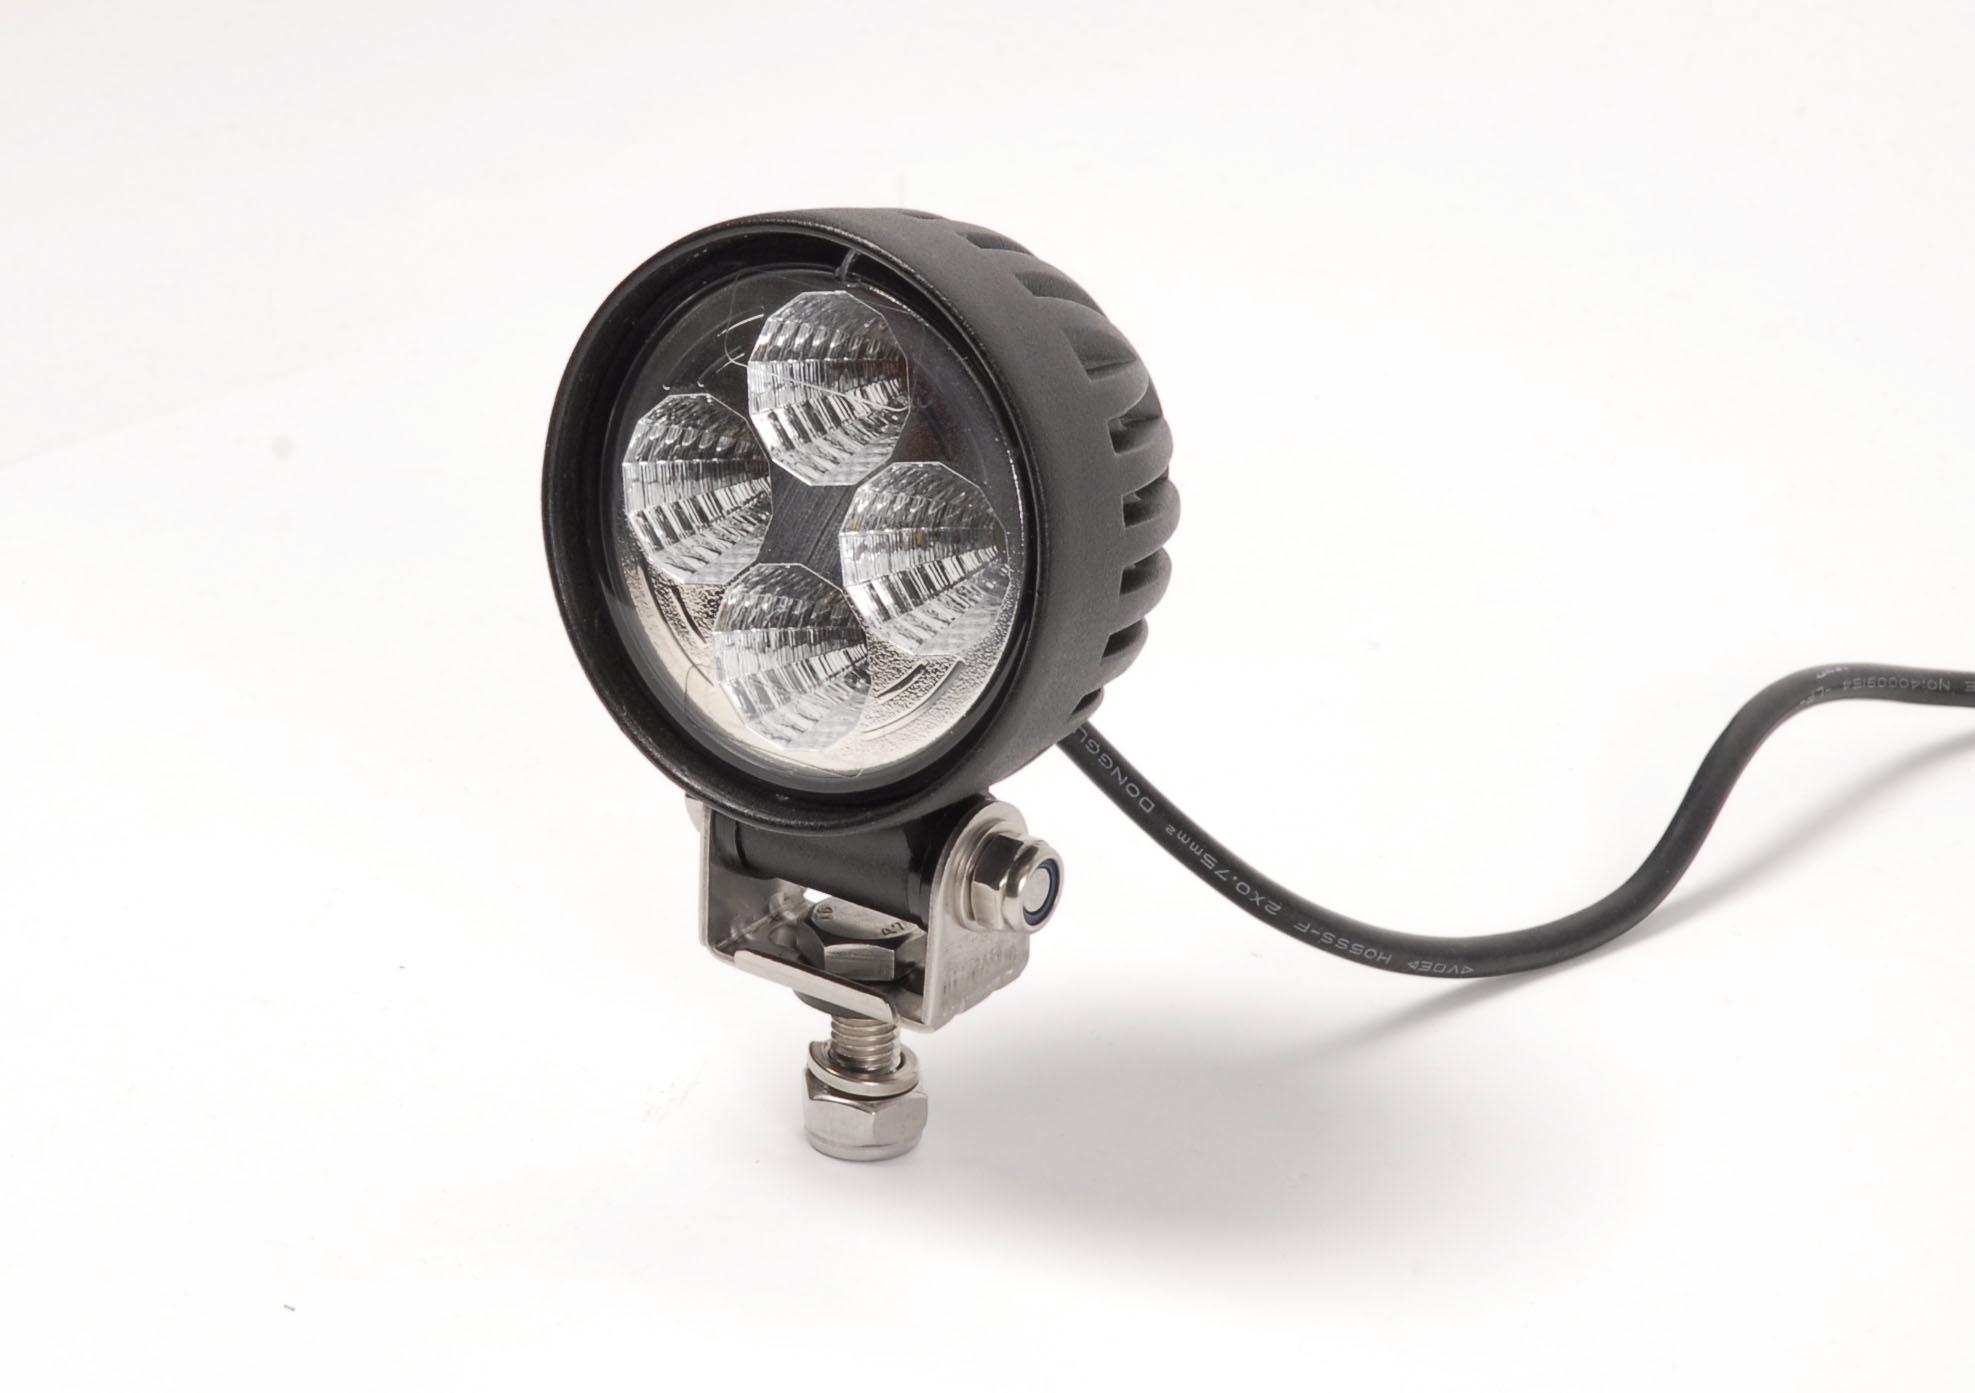 Britax L80 LED 600 lumen work lamp